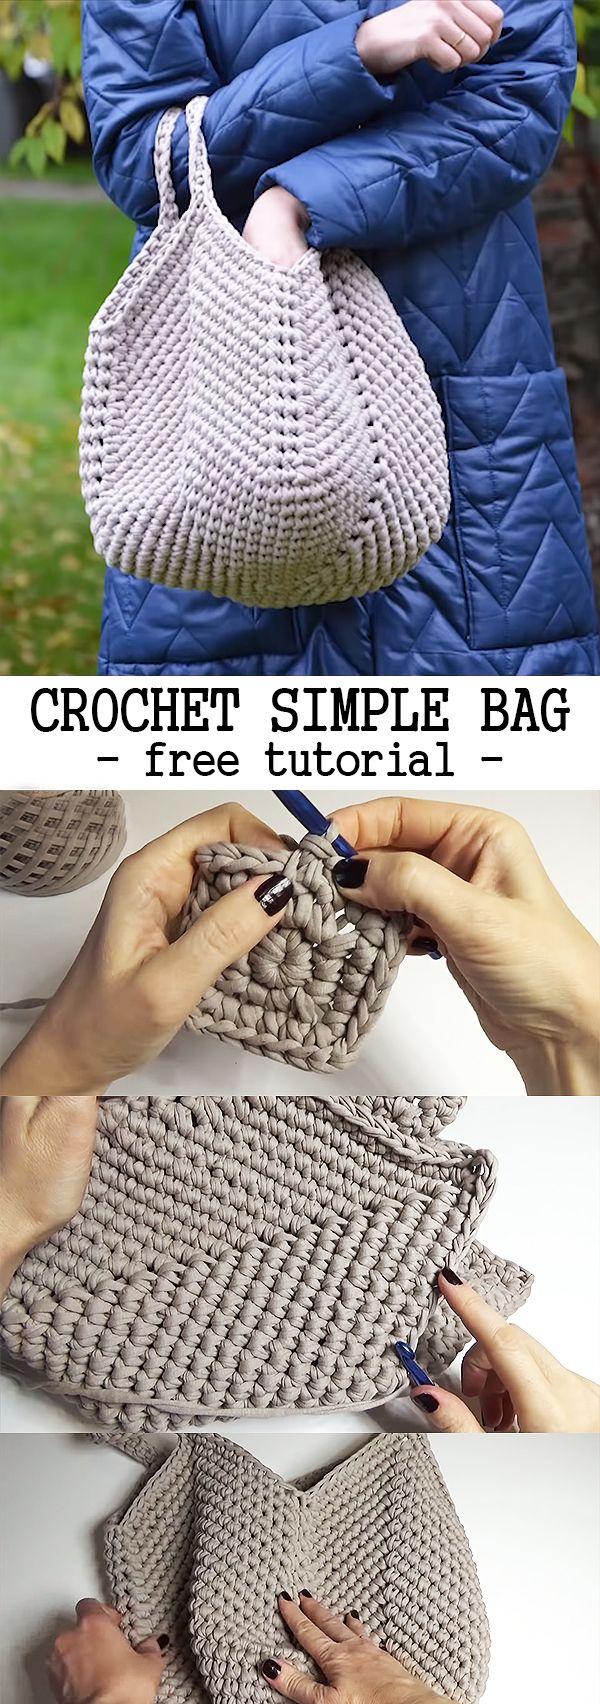 Crochet Simple Bag - CROCHET-HUB #crochethandbags